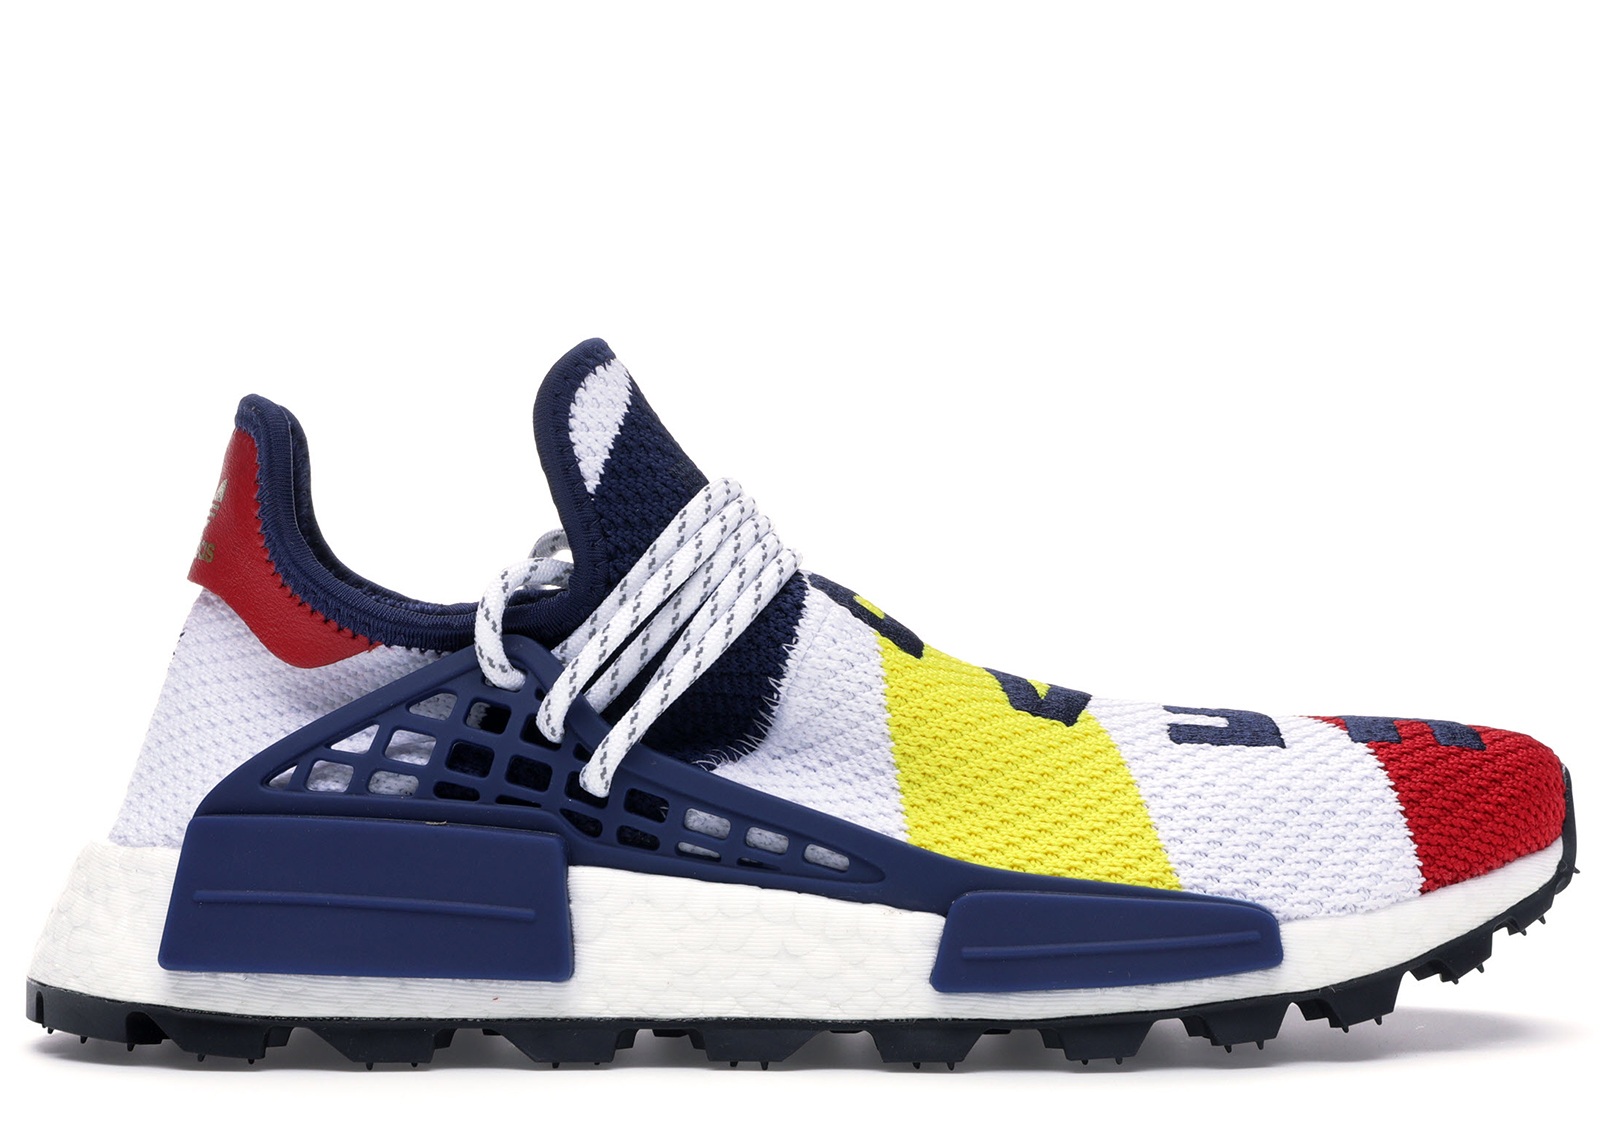 Hu Buy Nmd Sneakers Deadstock Shoesamp; Adidas vnOmN08w